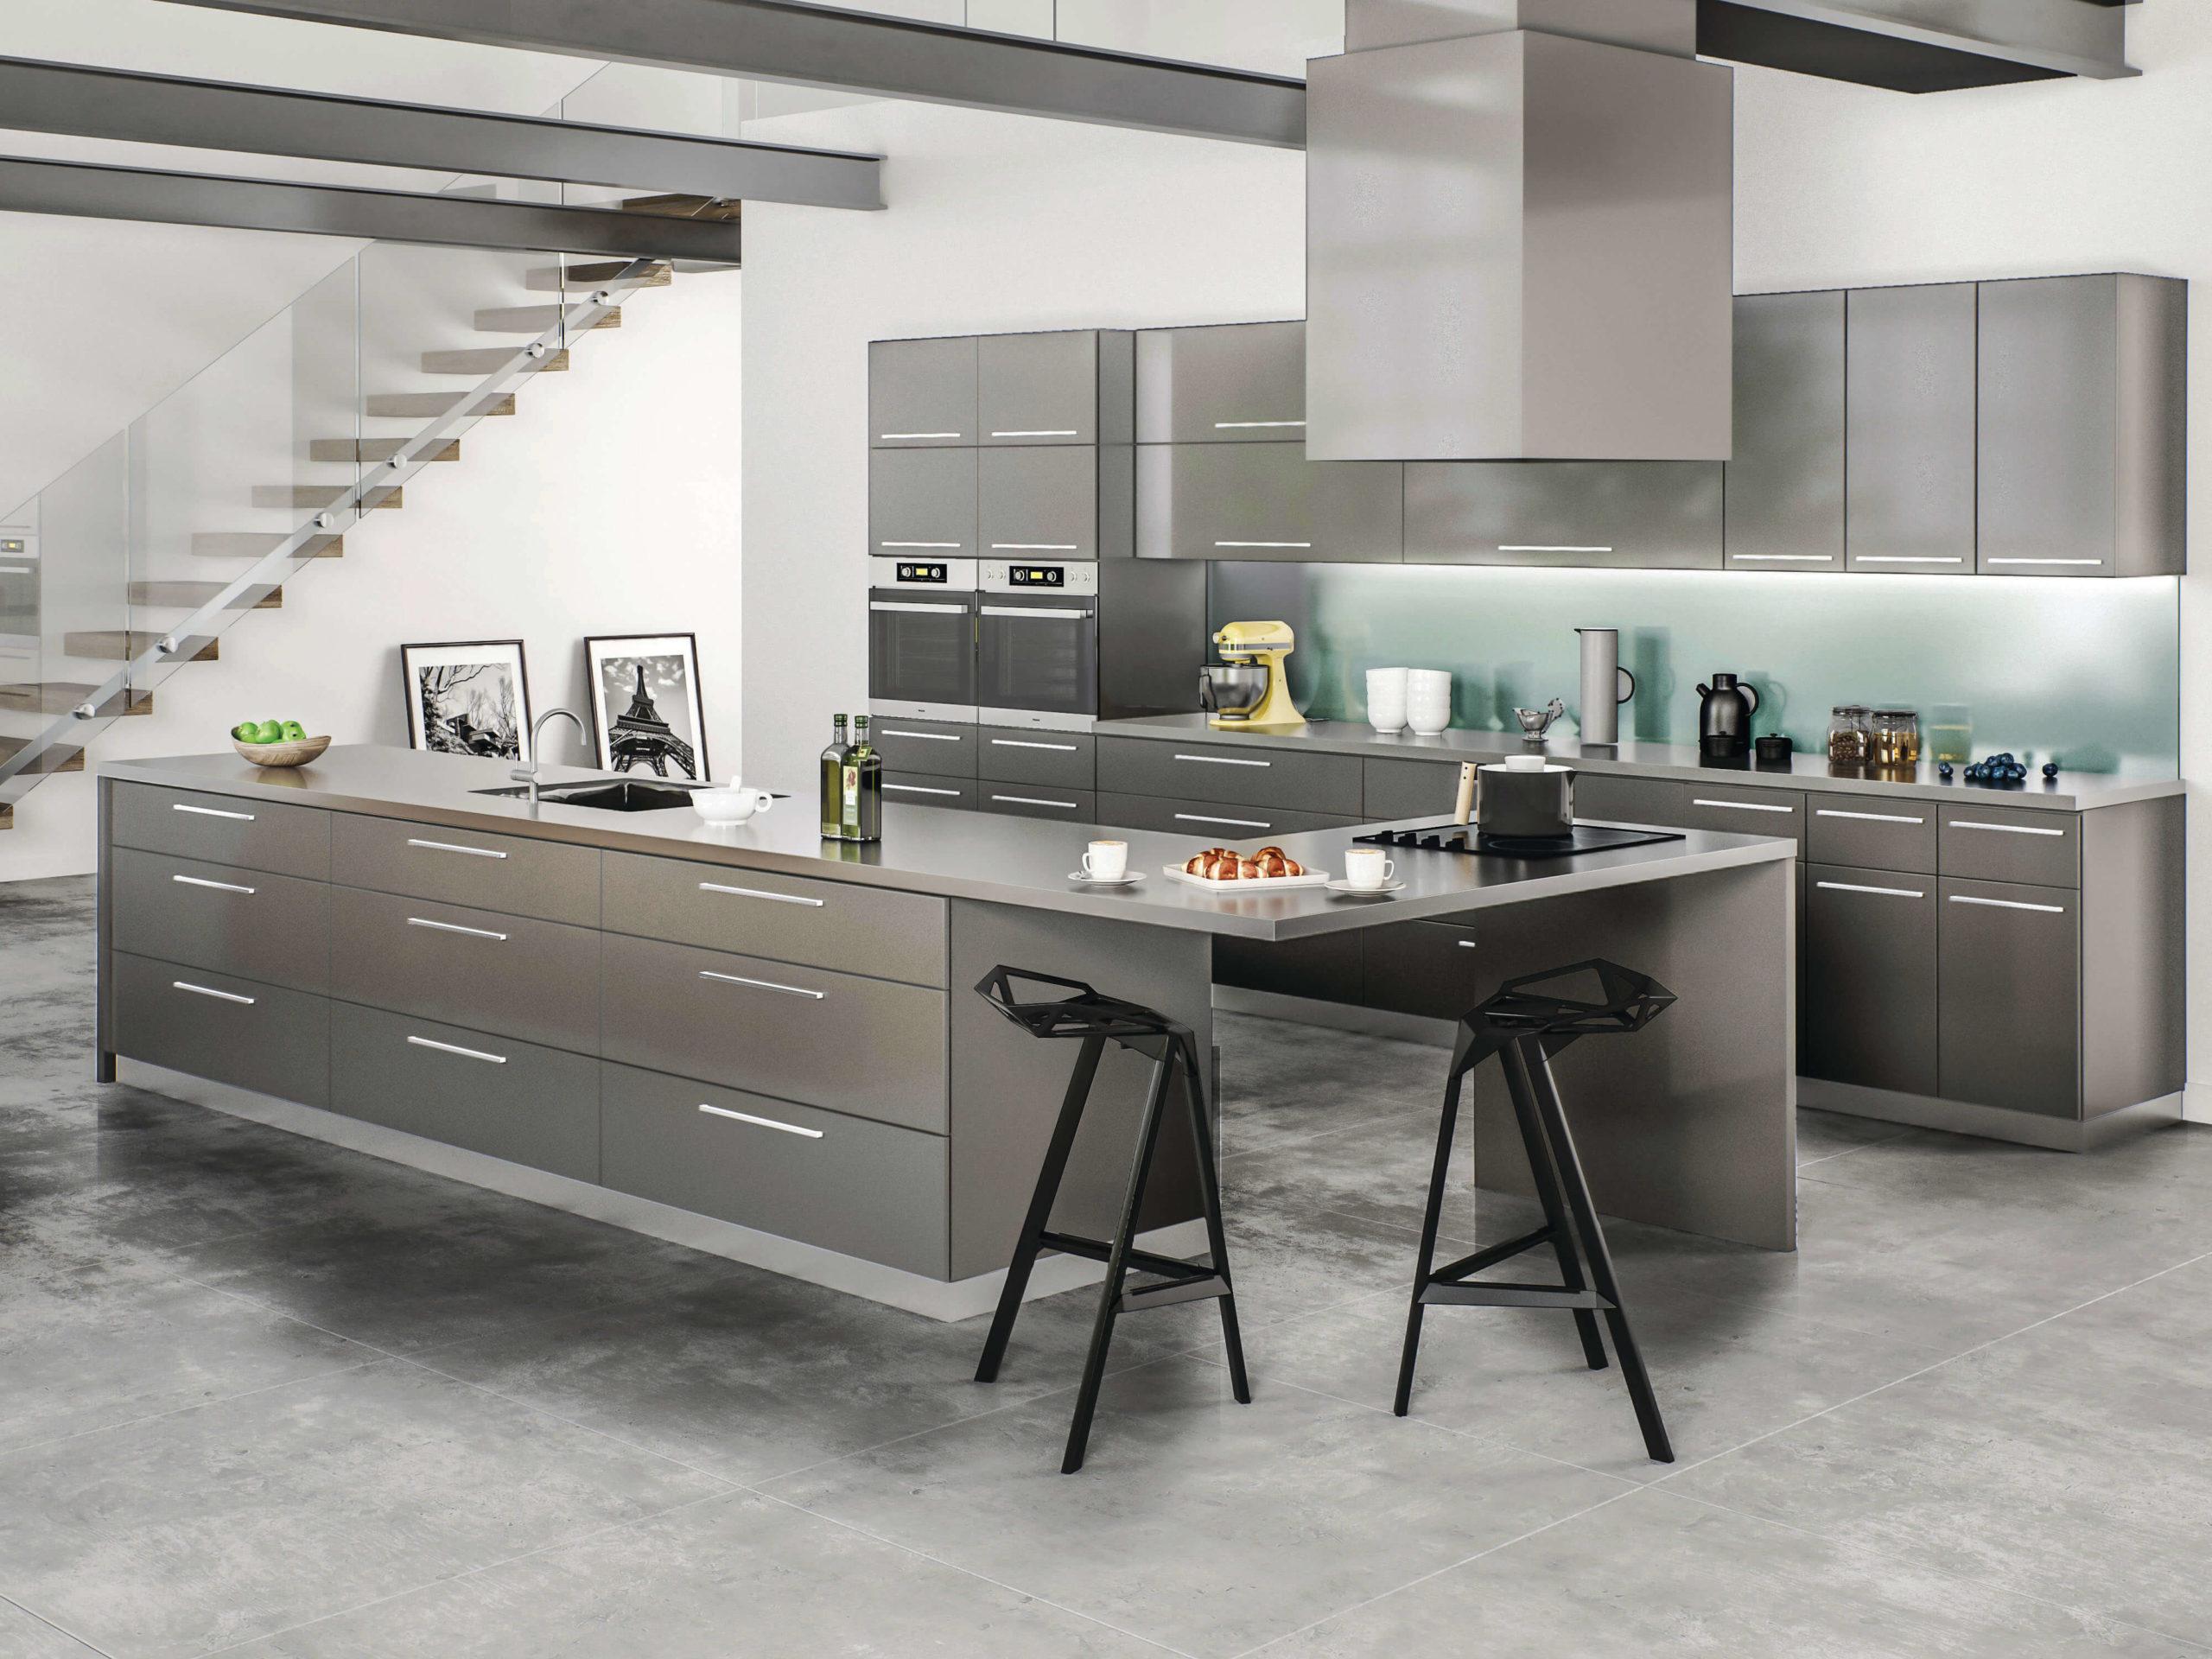 New kitchen featuring CNC Cabinetry Matrix Greystone shaker grey kitchen cabinets